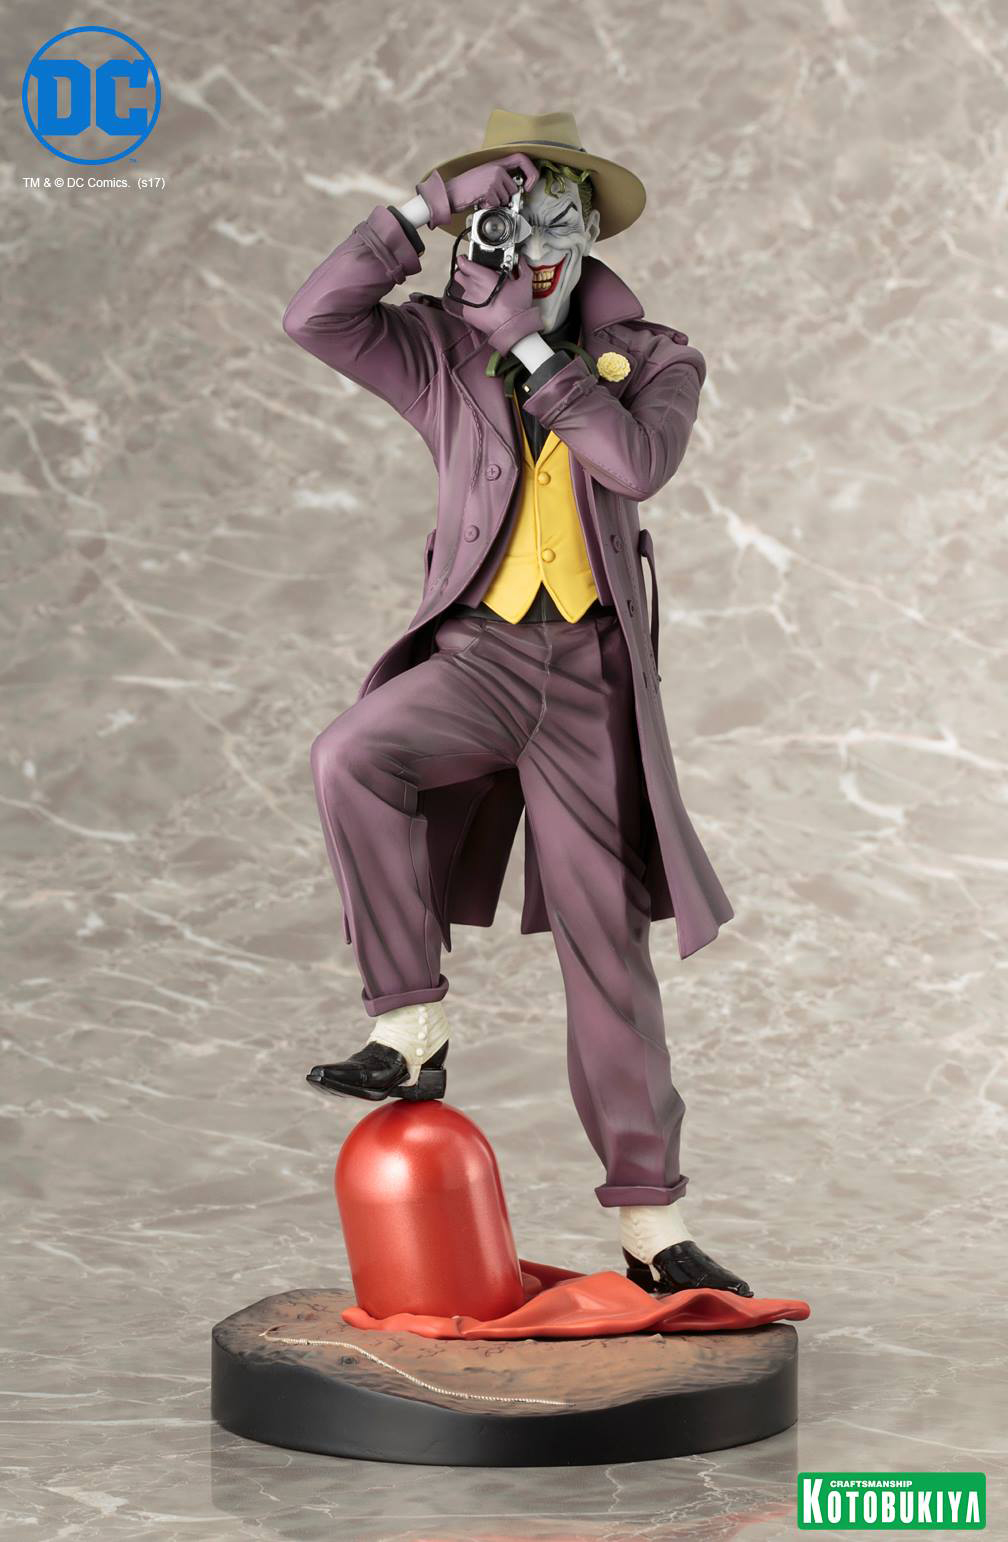 kotobukiya-joker-the-killing-joke-statue-2